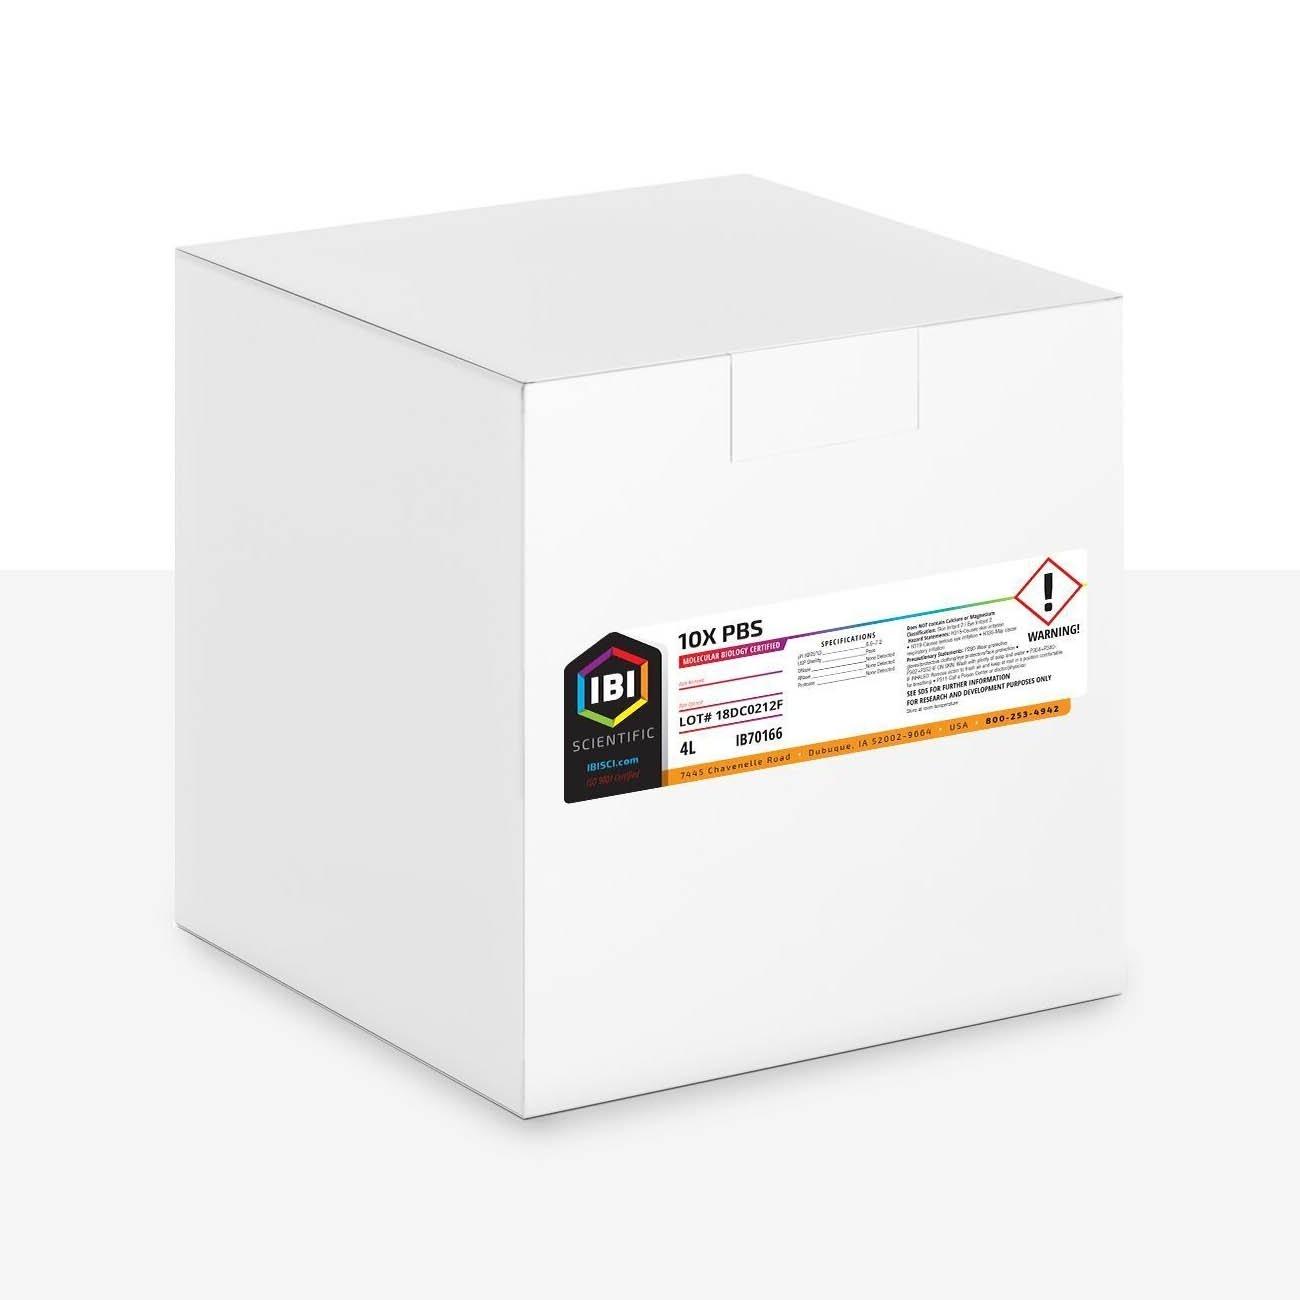 IBI 10X Phosphate Buffered Saline Premixed Solution - 4L